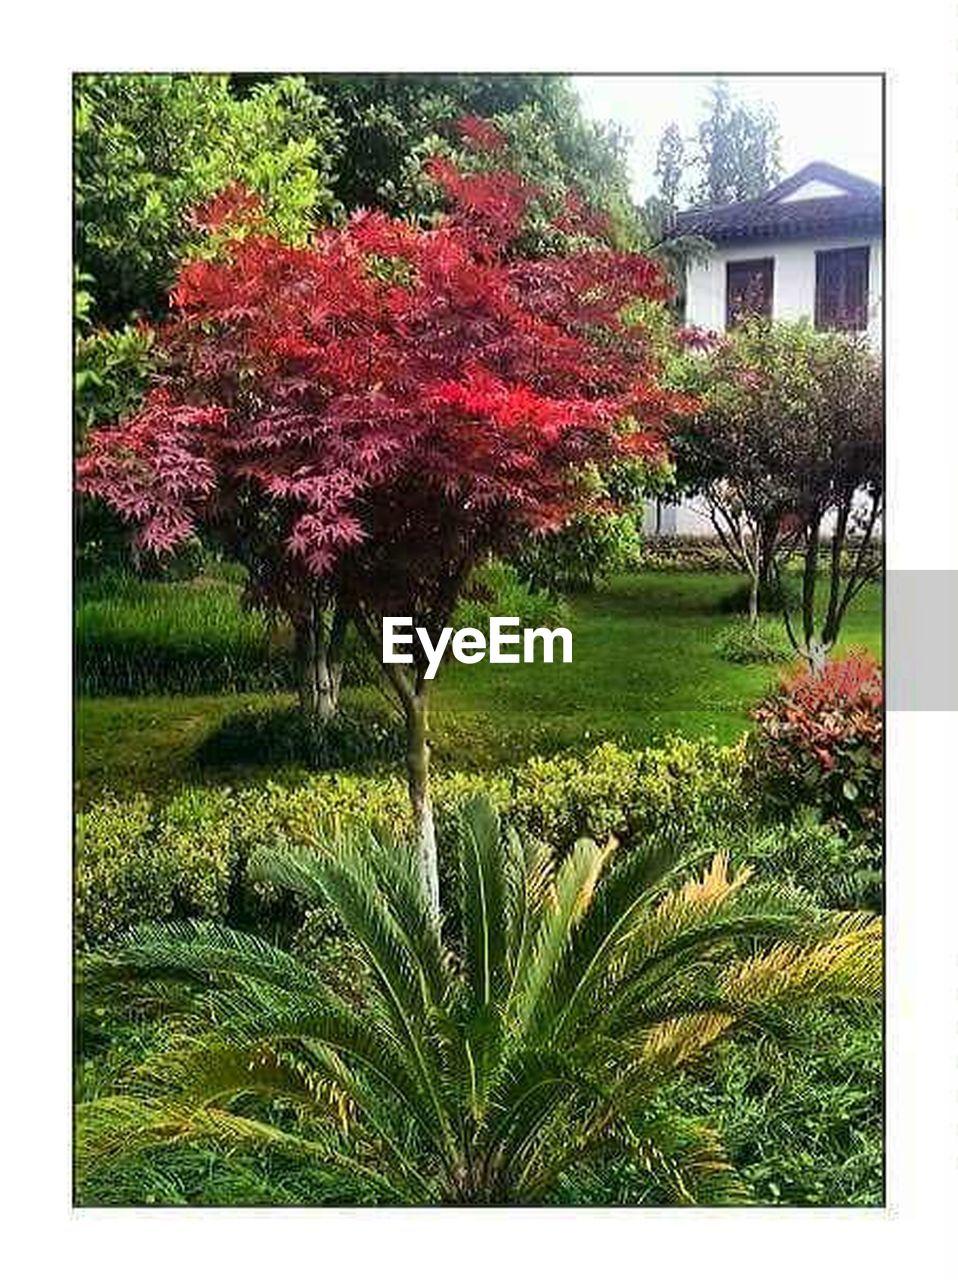 growth, garden, spring, vegetation, nature, grass, foliage, tree, no people